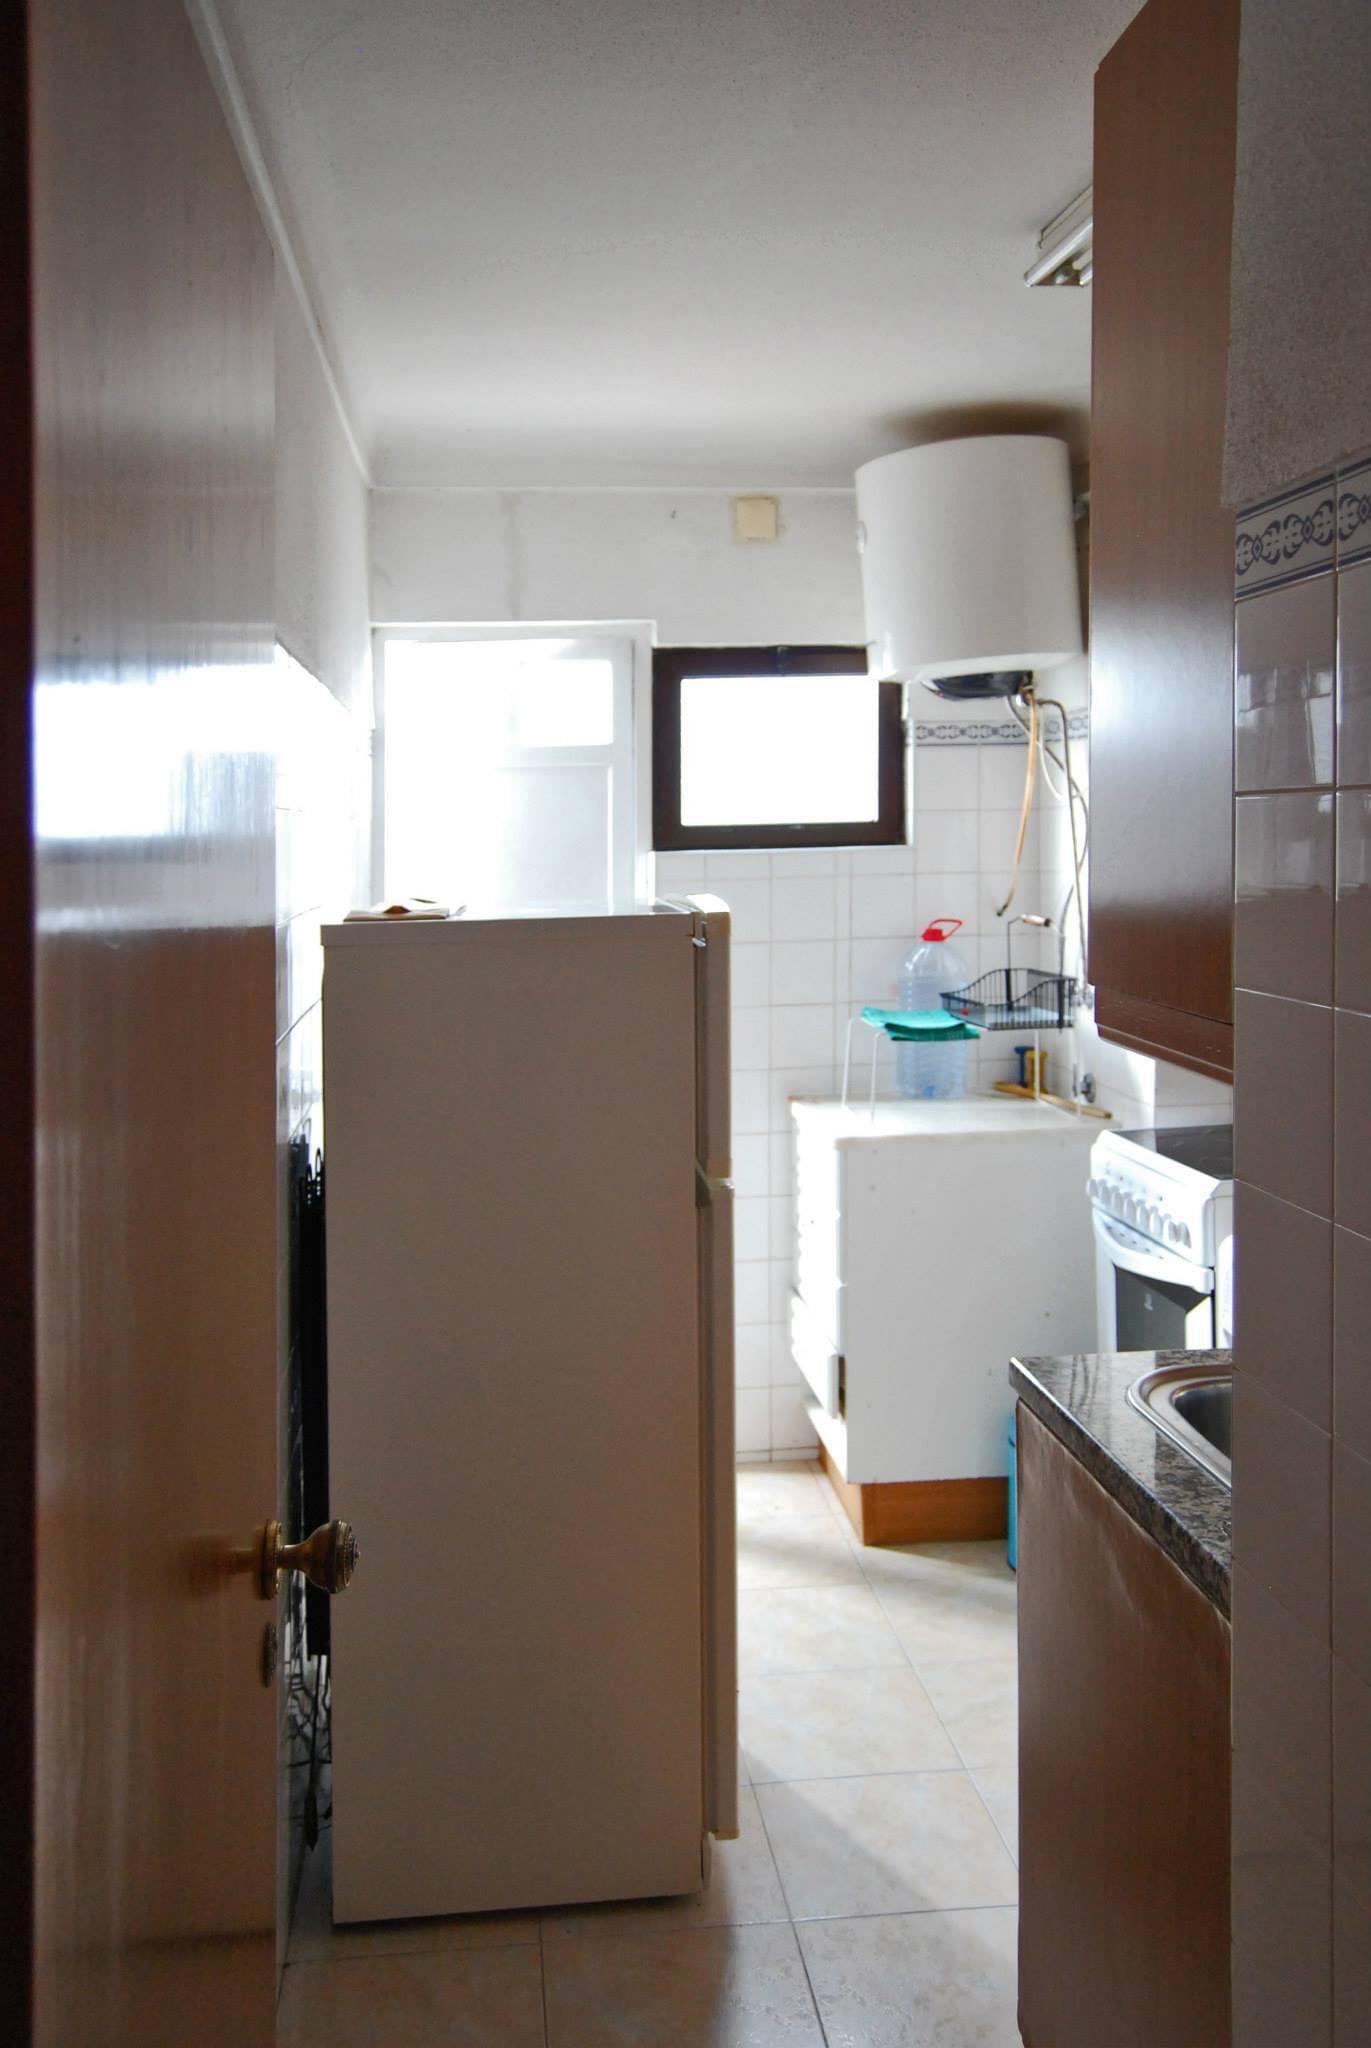 pf17427-apartamento-t1-lisboa-3f86cceb-9fcf-4755-8823-7816dfca278c